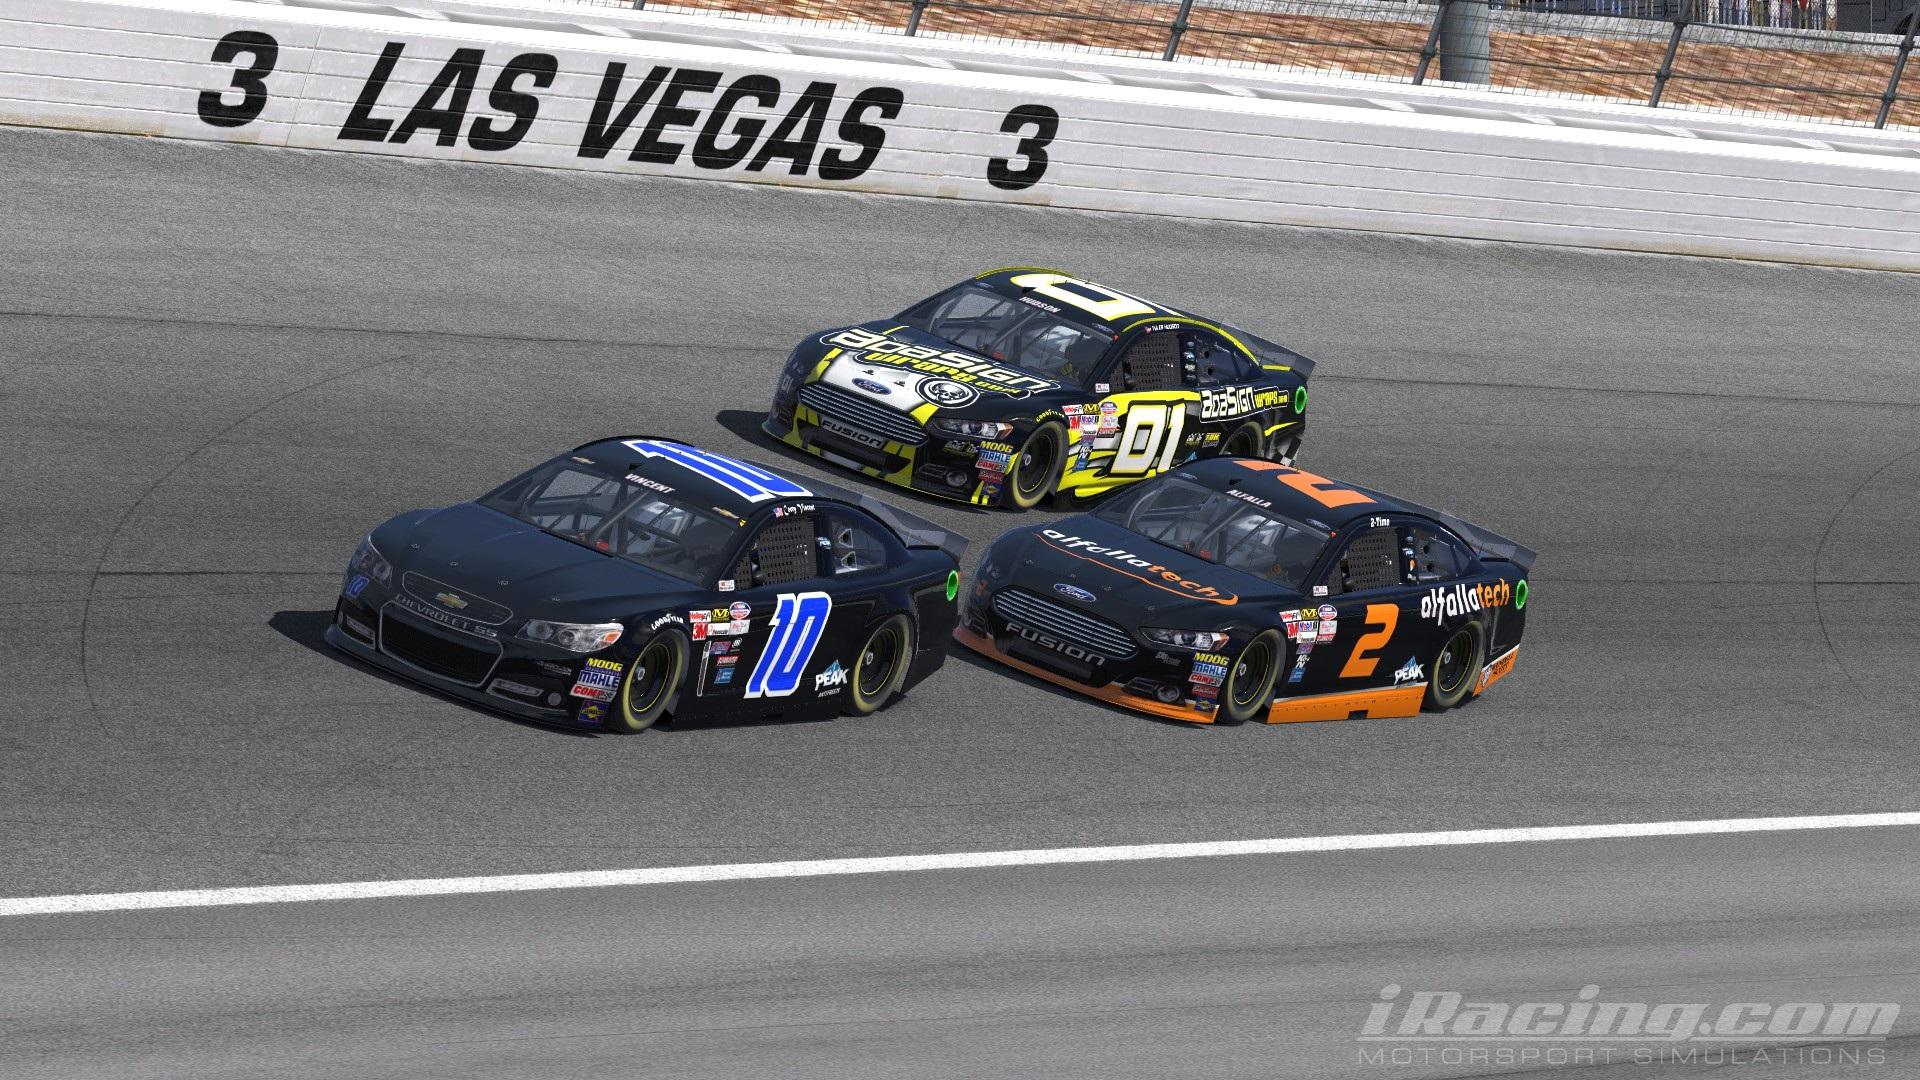 Vincent Takes Nascar Victory At Las Vegas Iracing Com